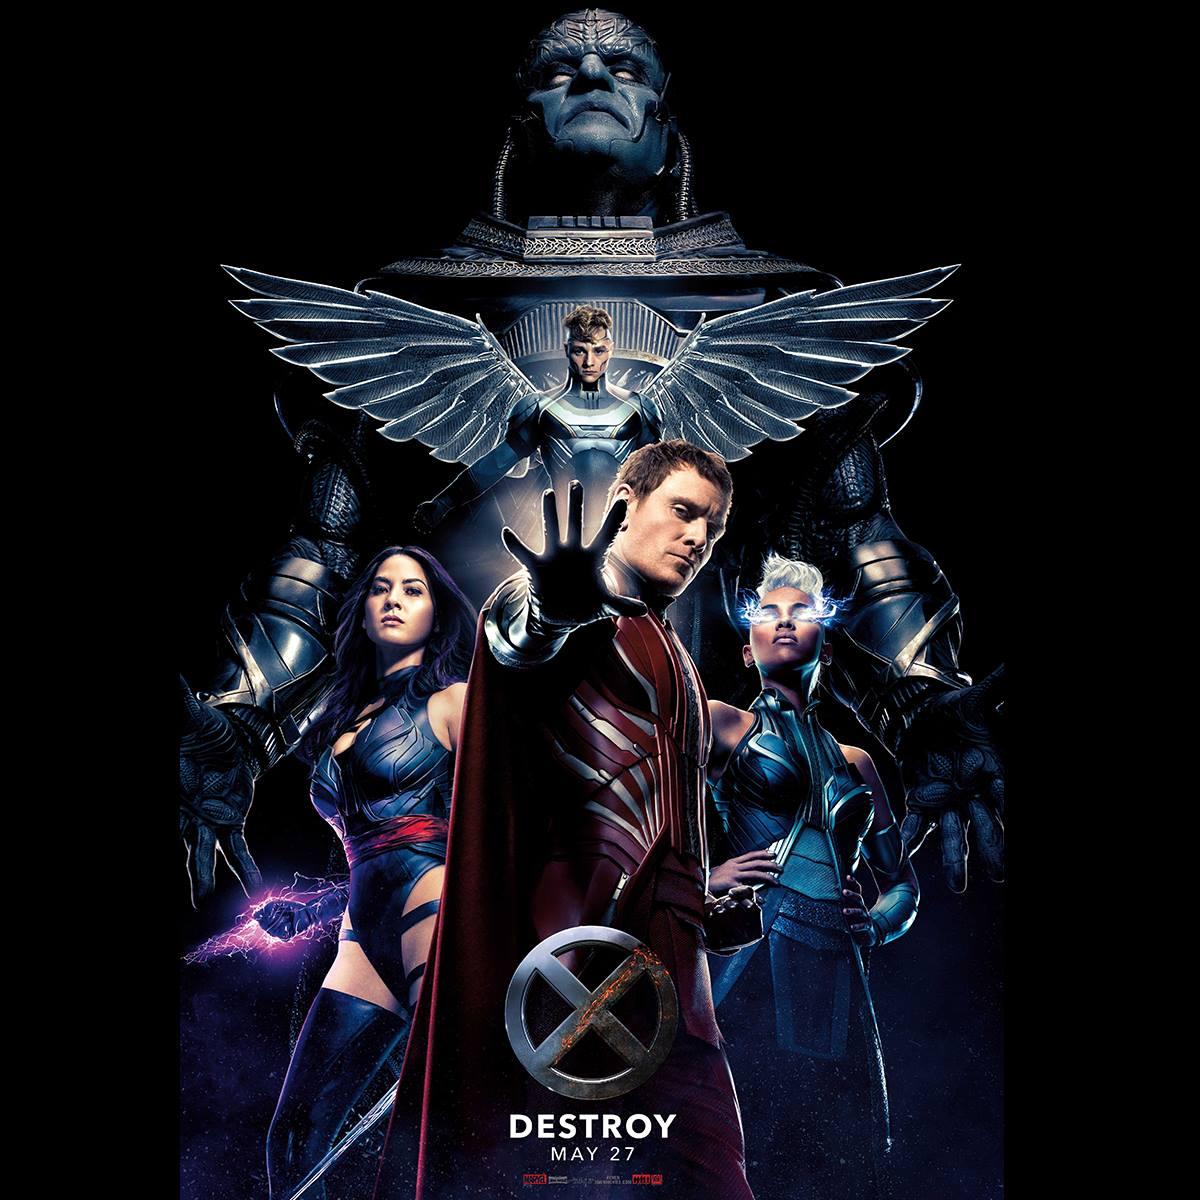 X-Men: Apocalypse DESTROY poster